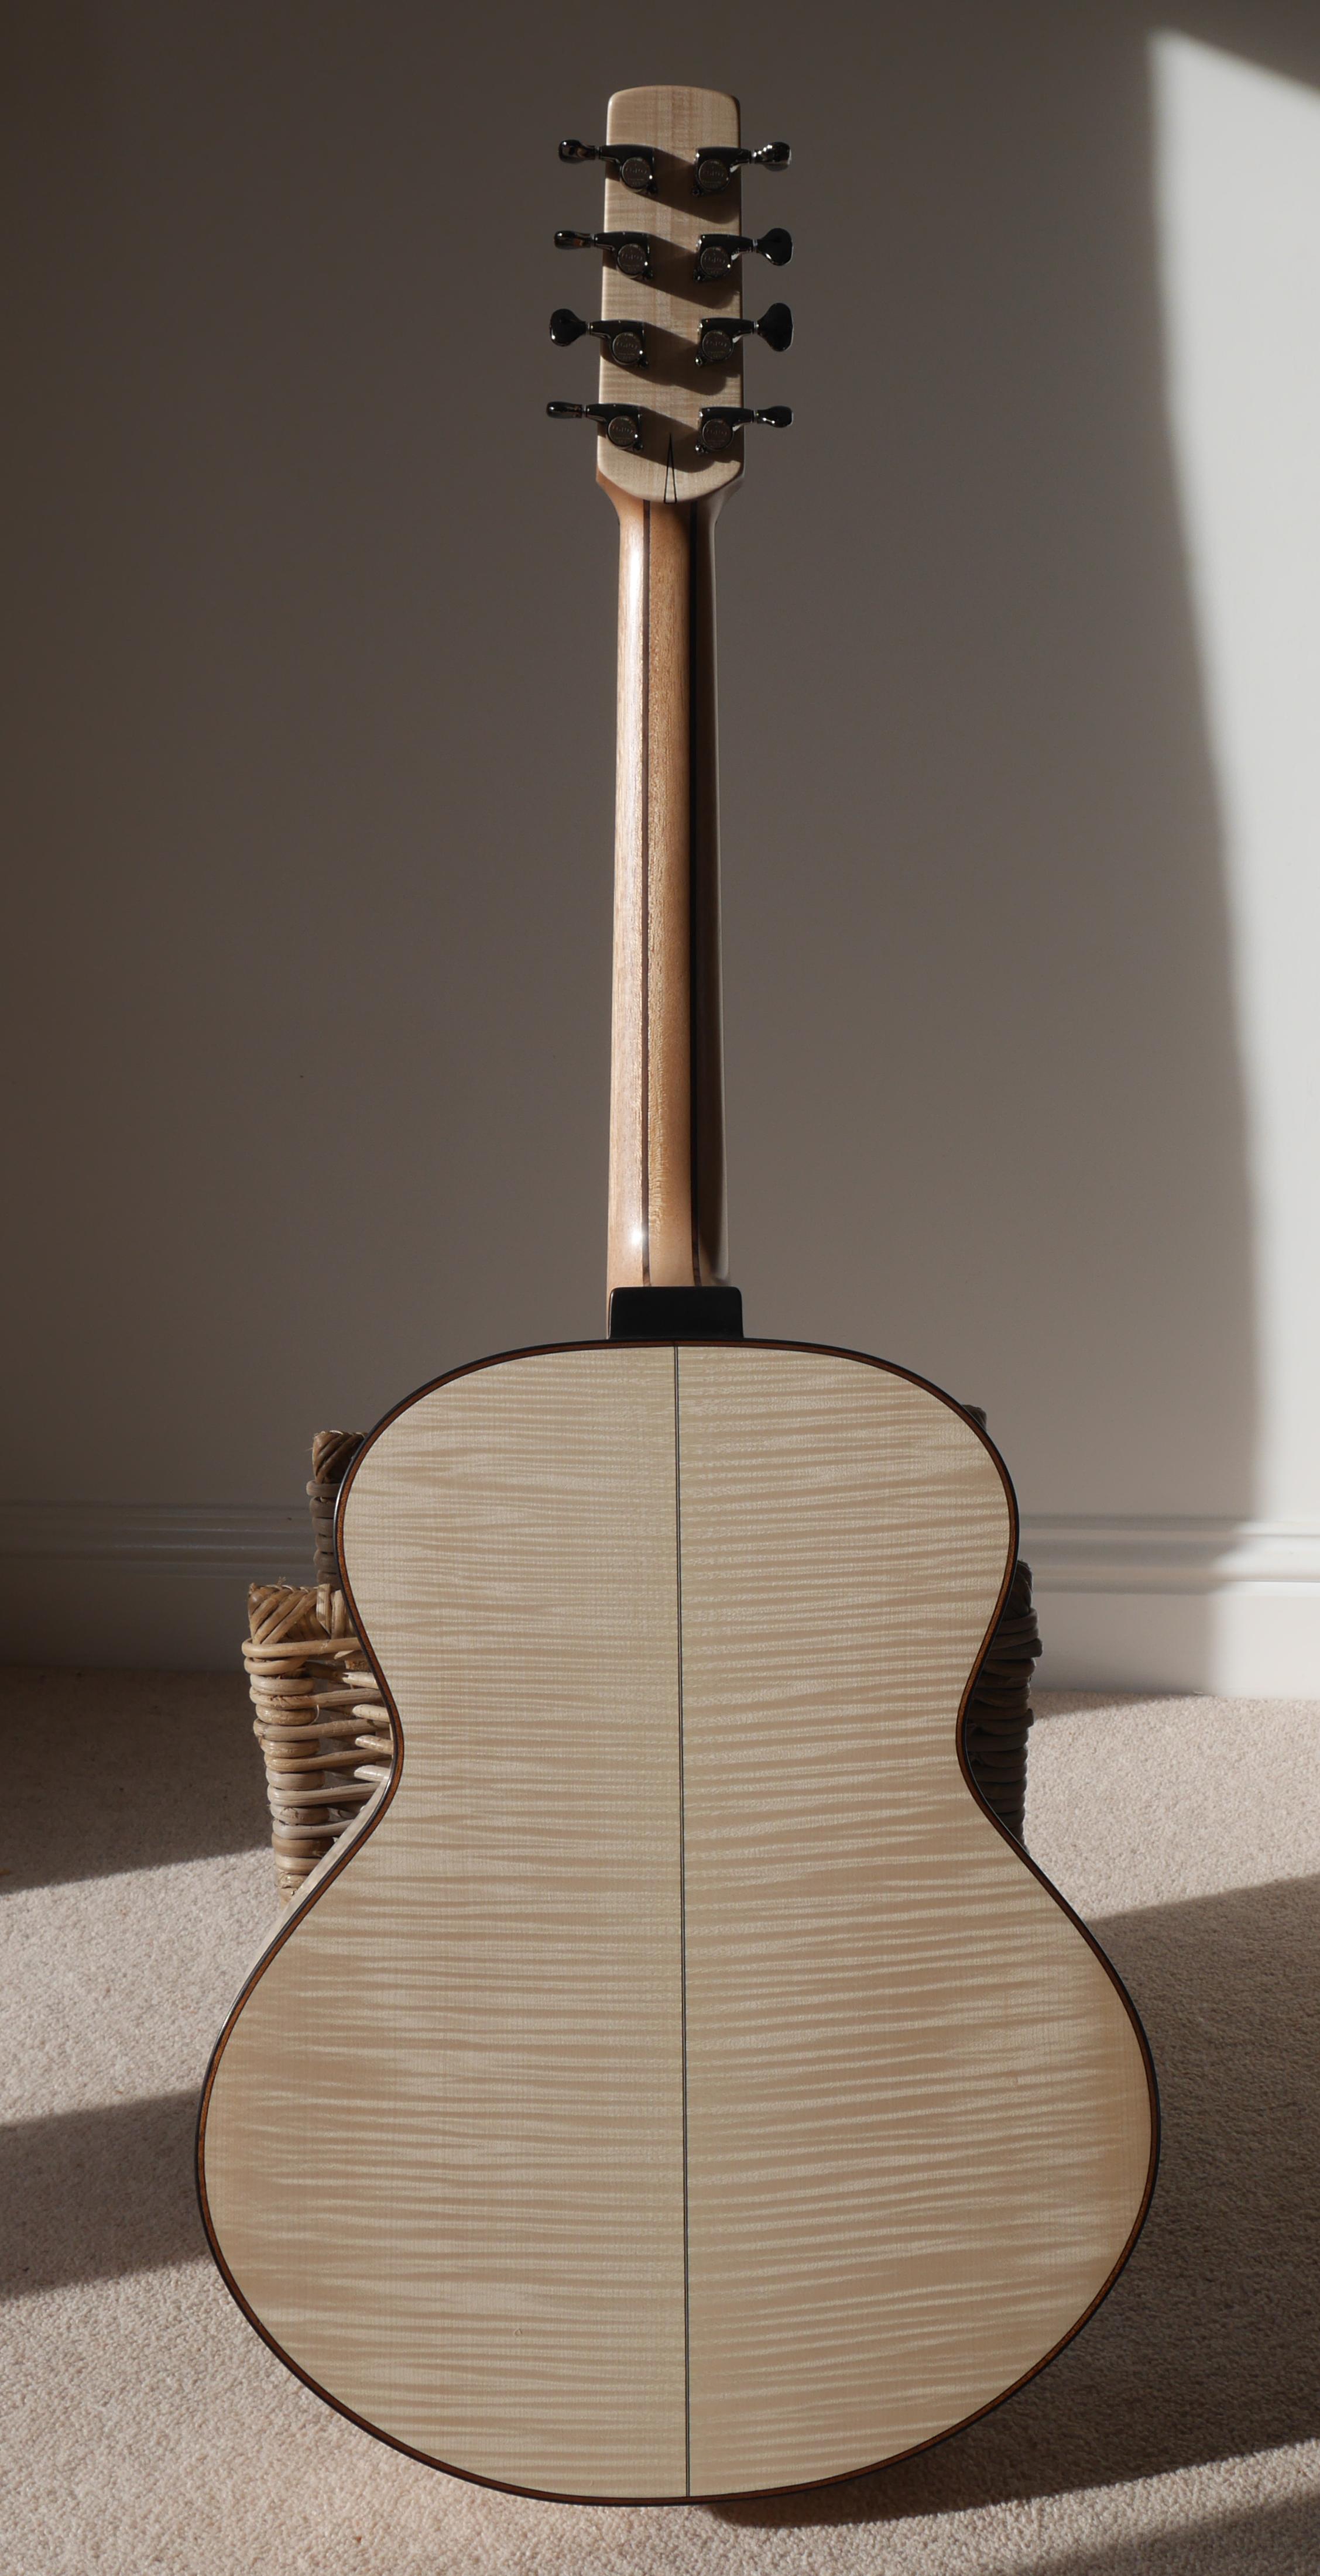 montgomery baritone, 8 string, acoustic guitar, montgomery guitar, andreas montgomery, flammed maple